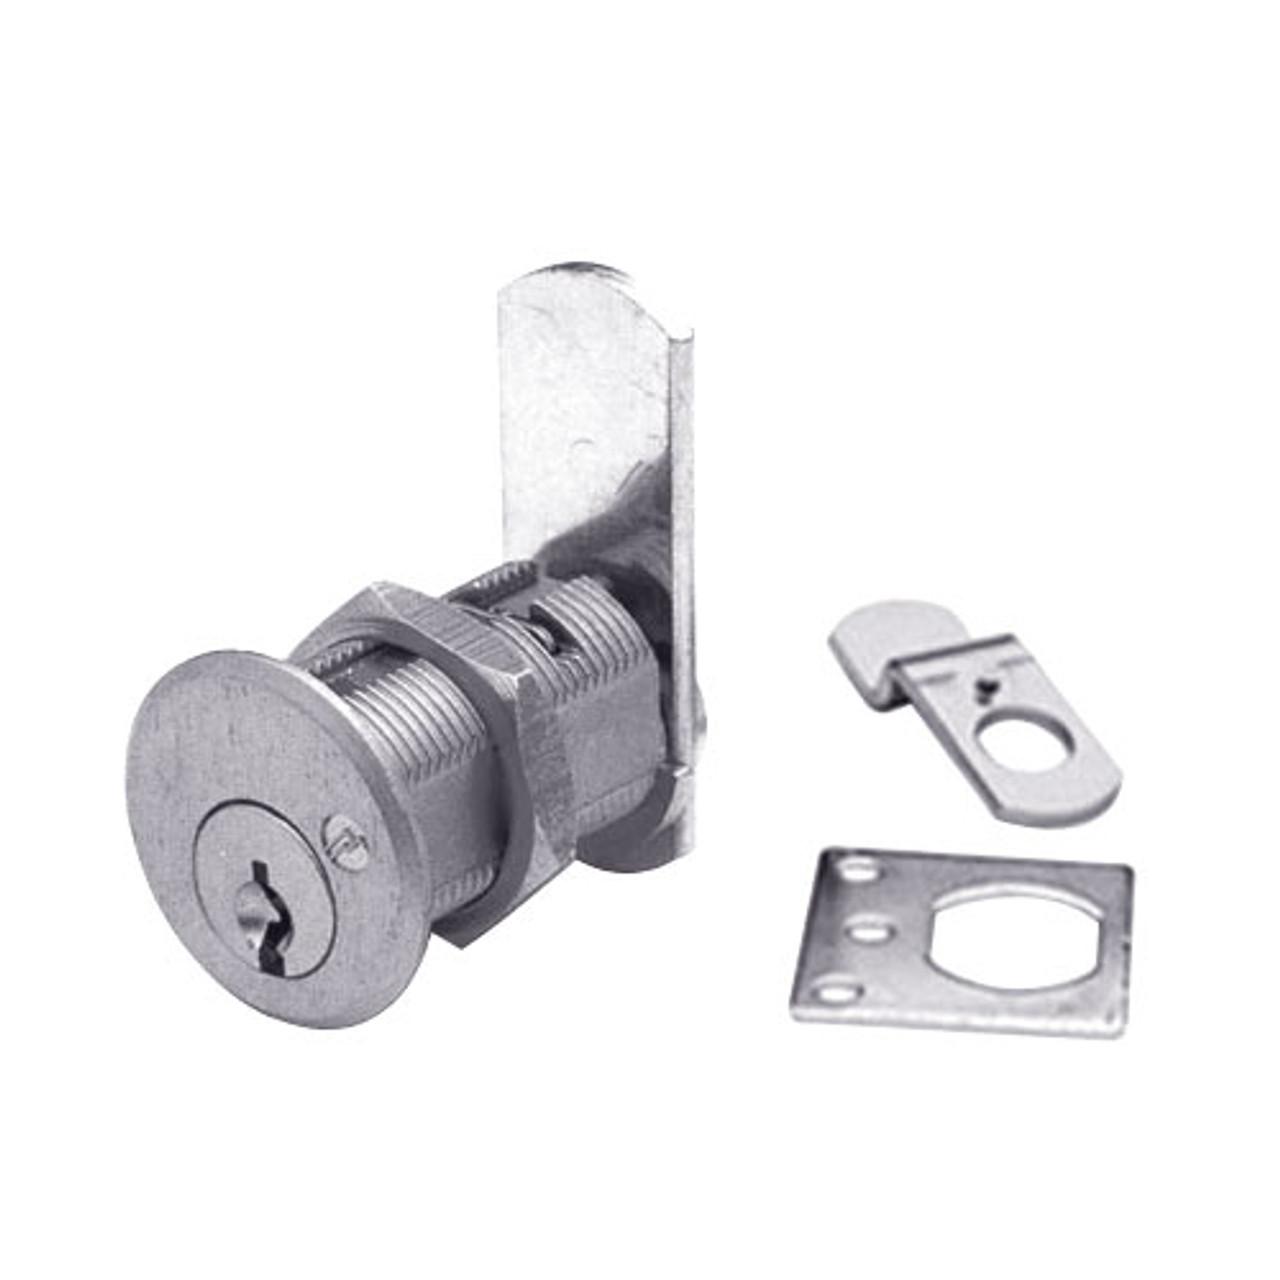 Olympus DCR1-KD-26D Cam Locks in Satin Chrome Finish